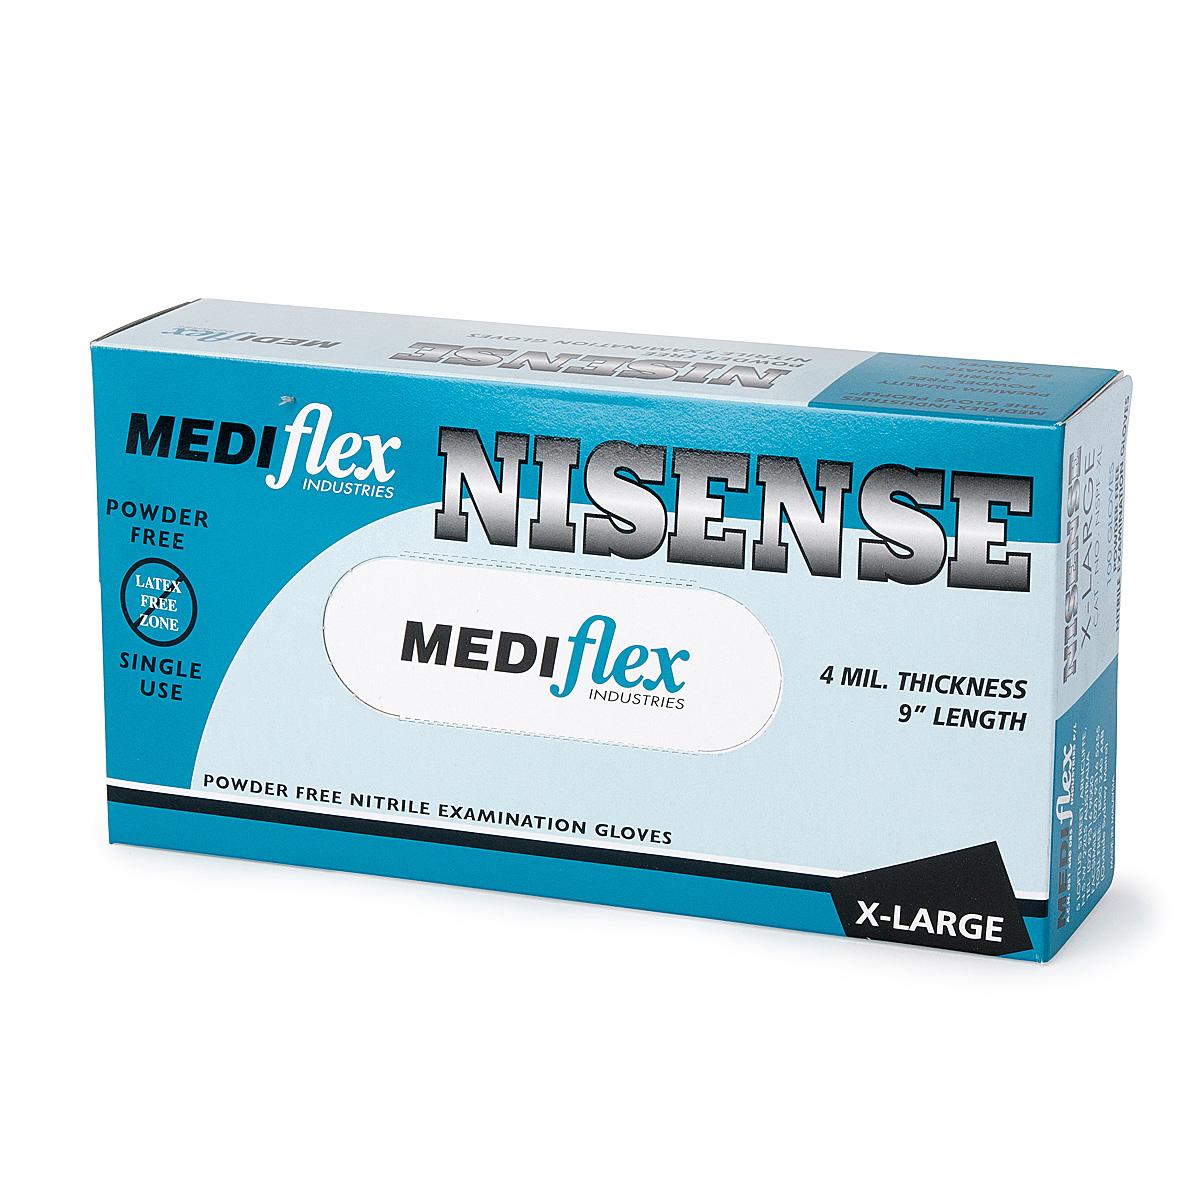 Mediflex Nisense